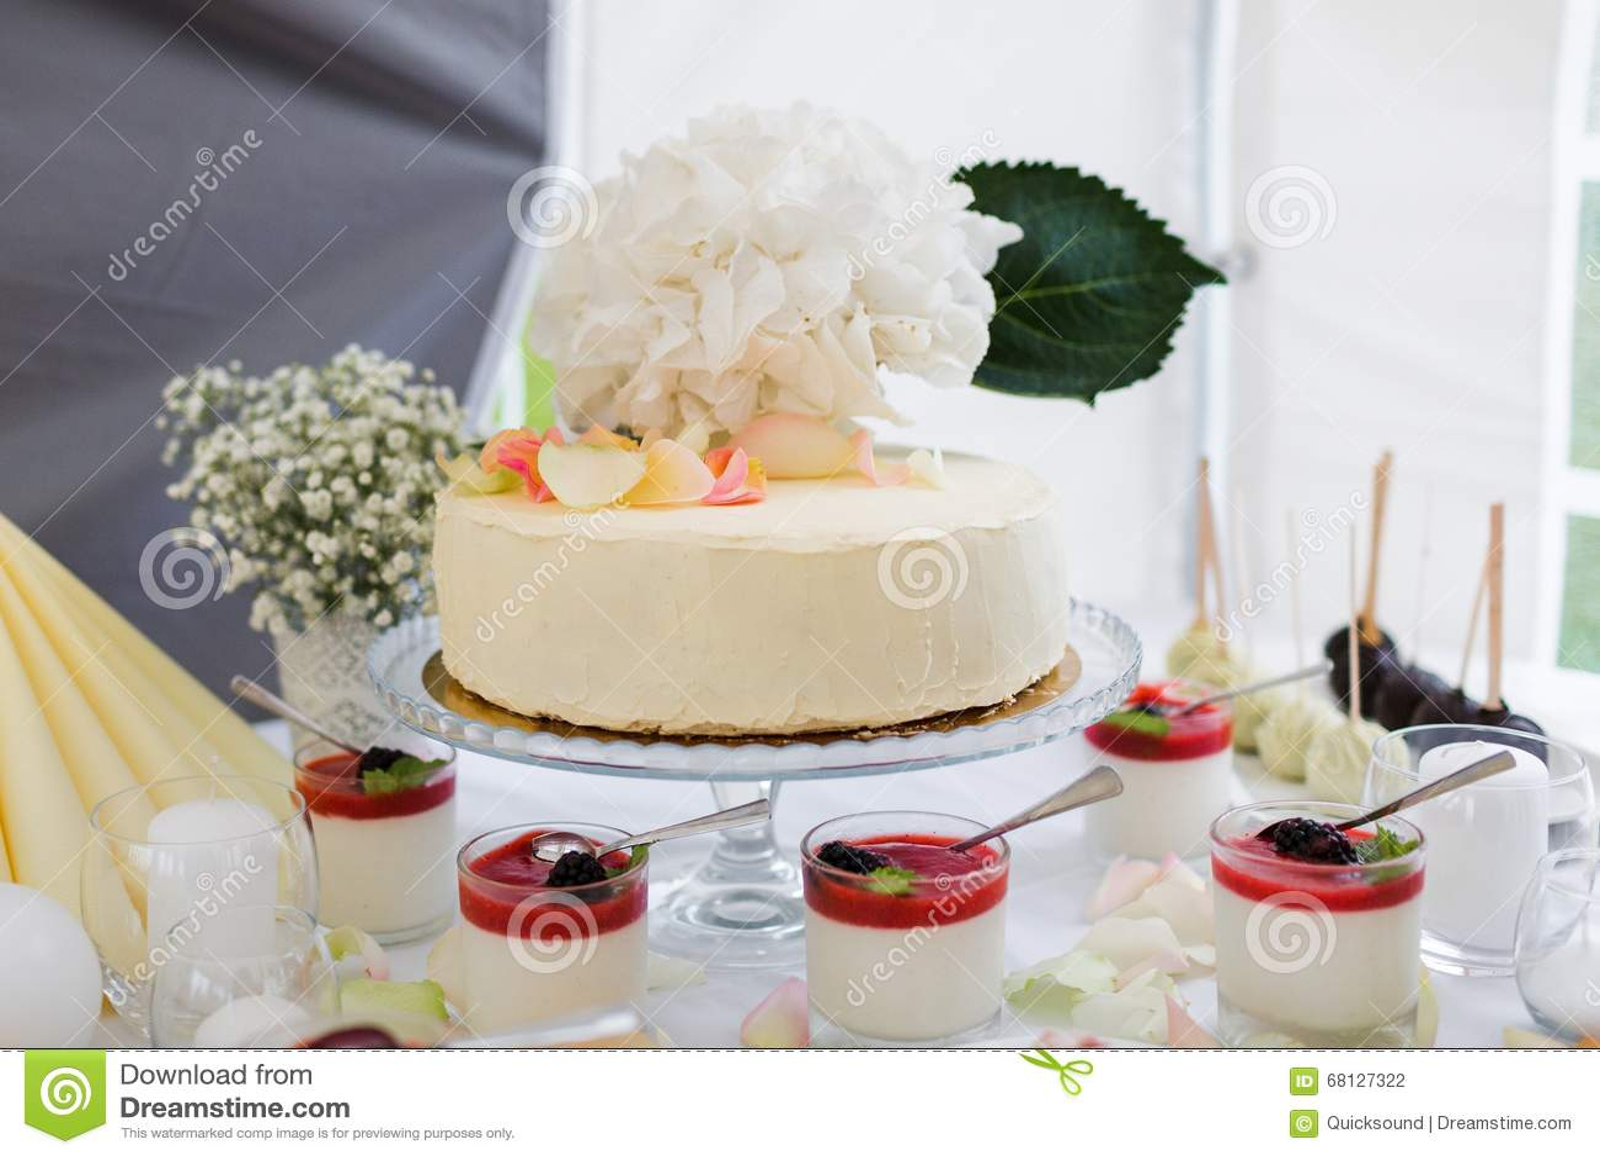 Yogurht deserts stock photo. Image of arrangement, sauce - 68127322